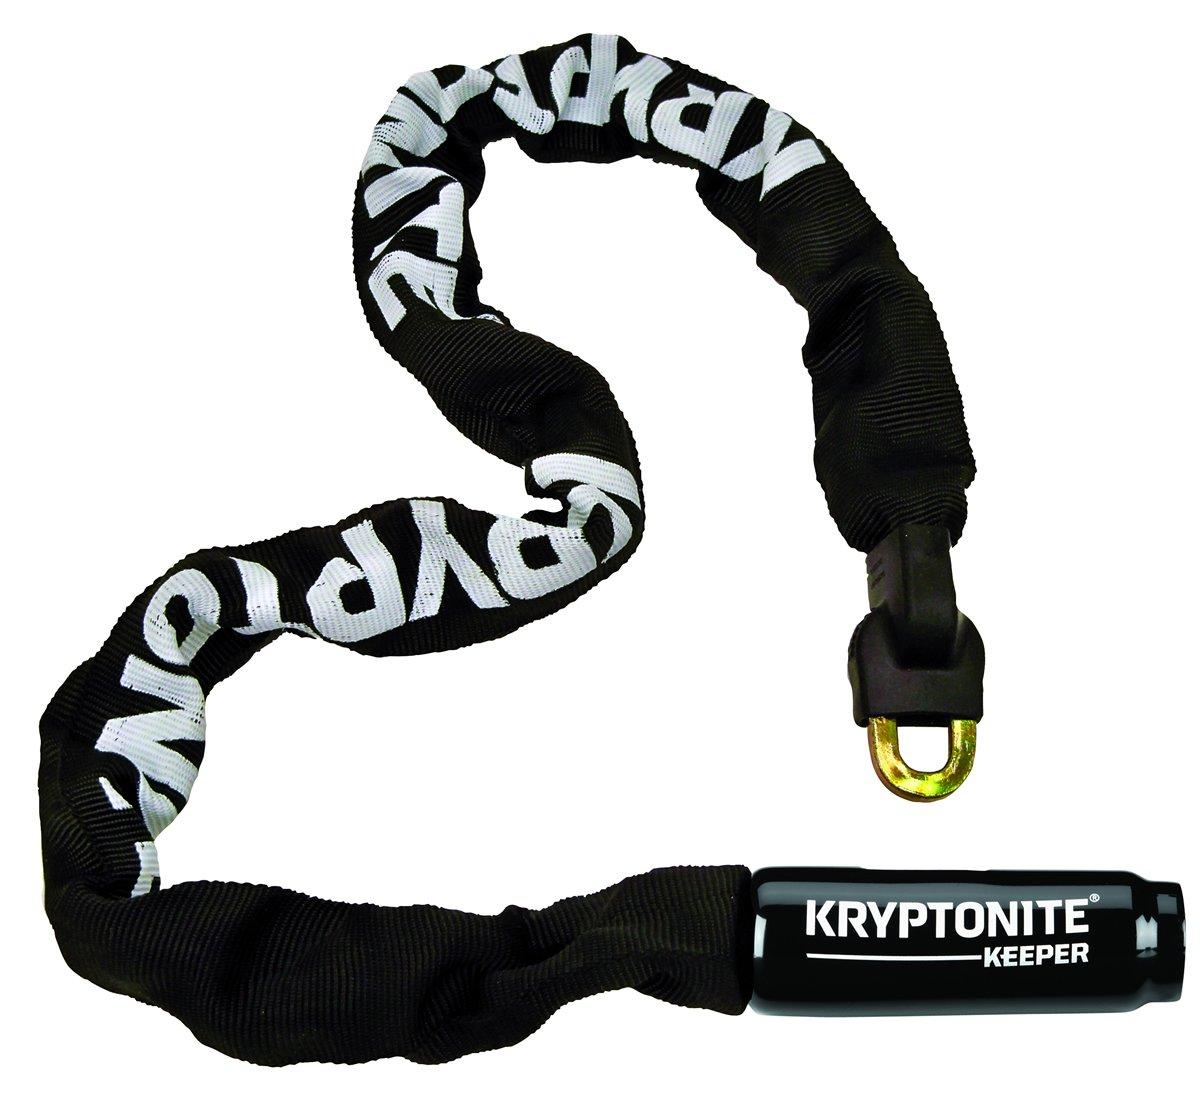 Kryptonite Antivol Chaîne KEEPER 785 (7 mm x 85 cm) product image